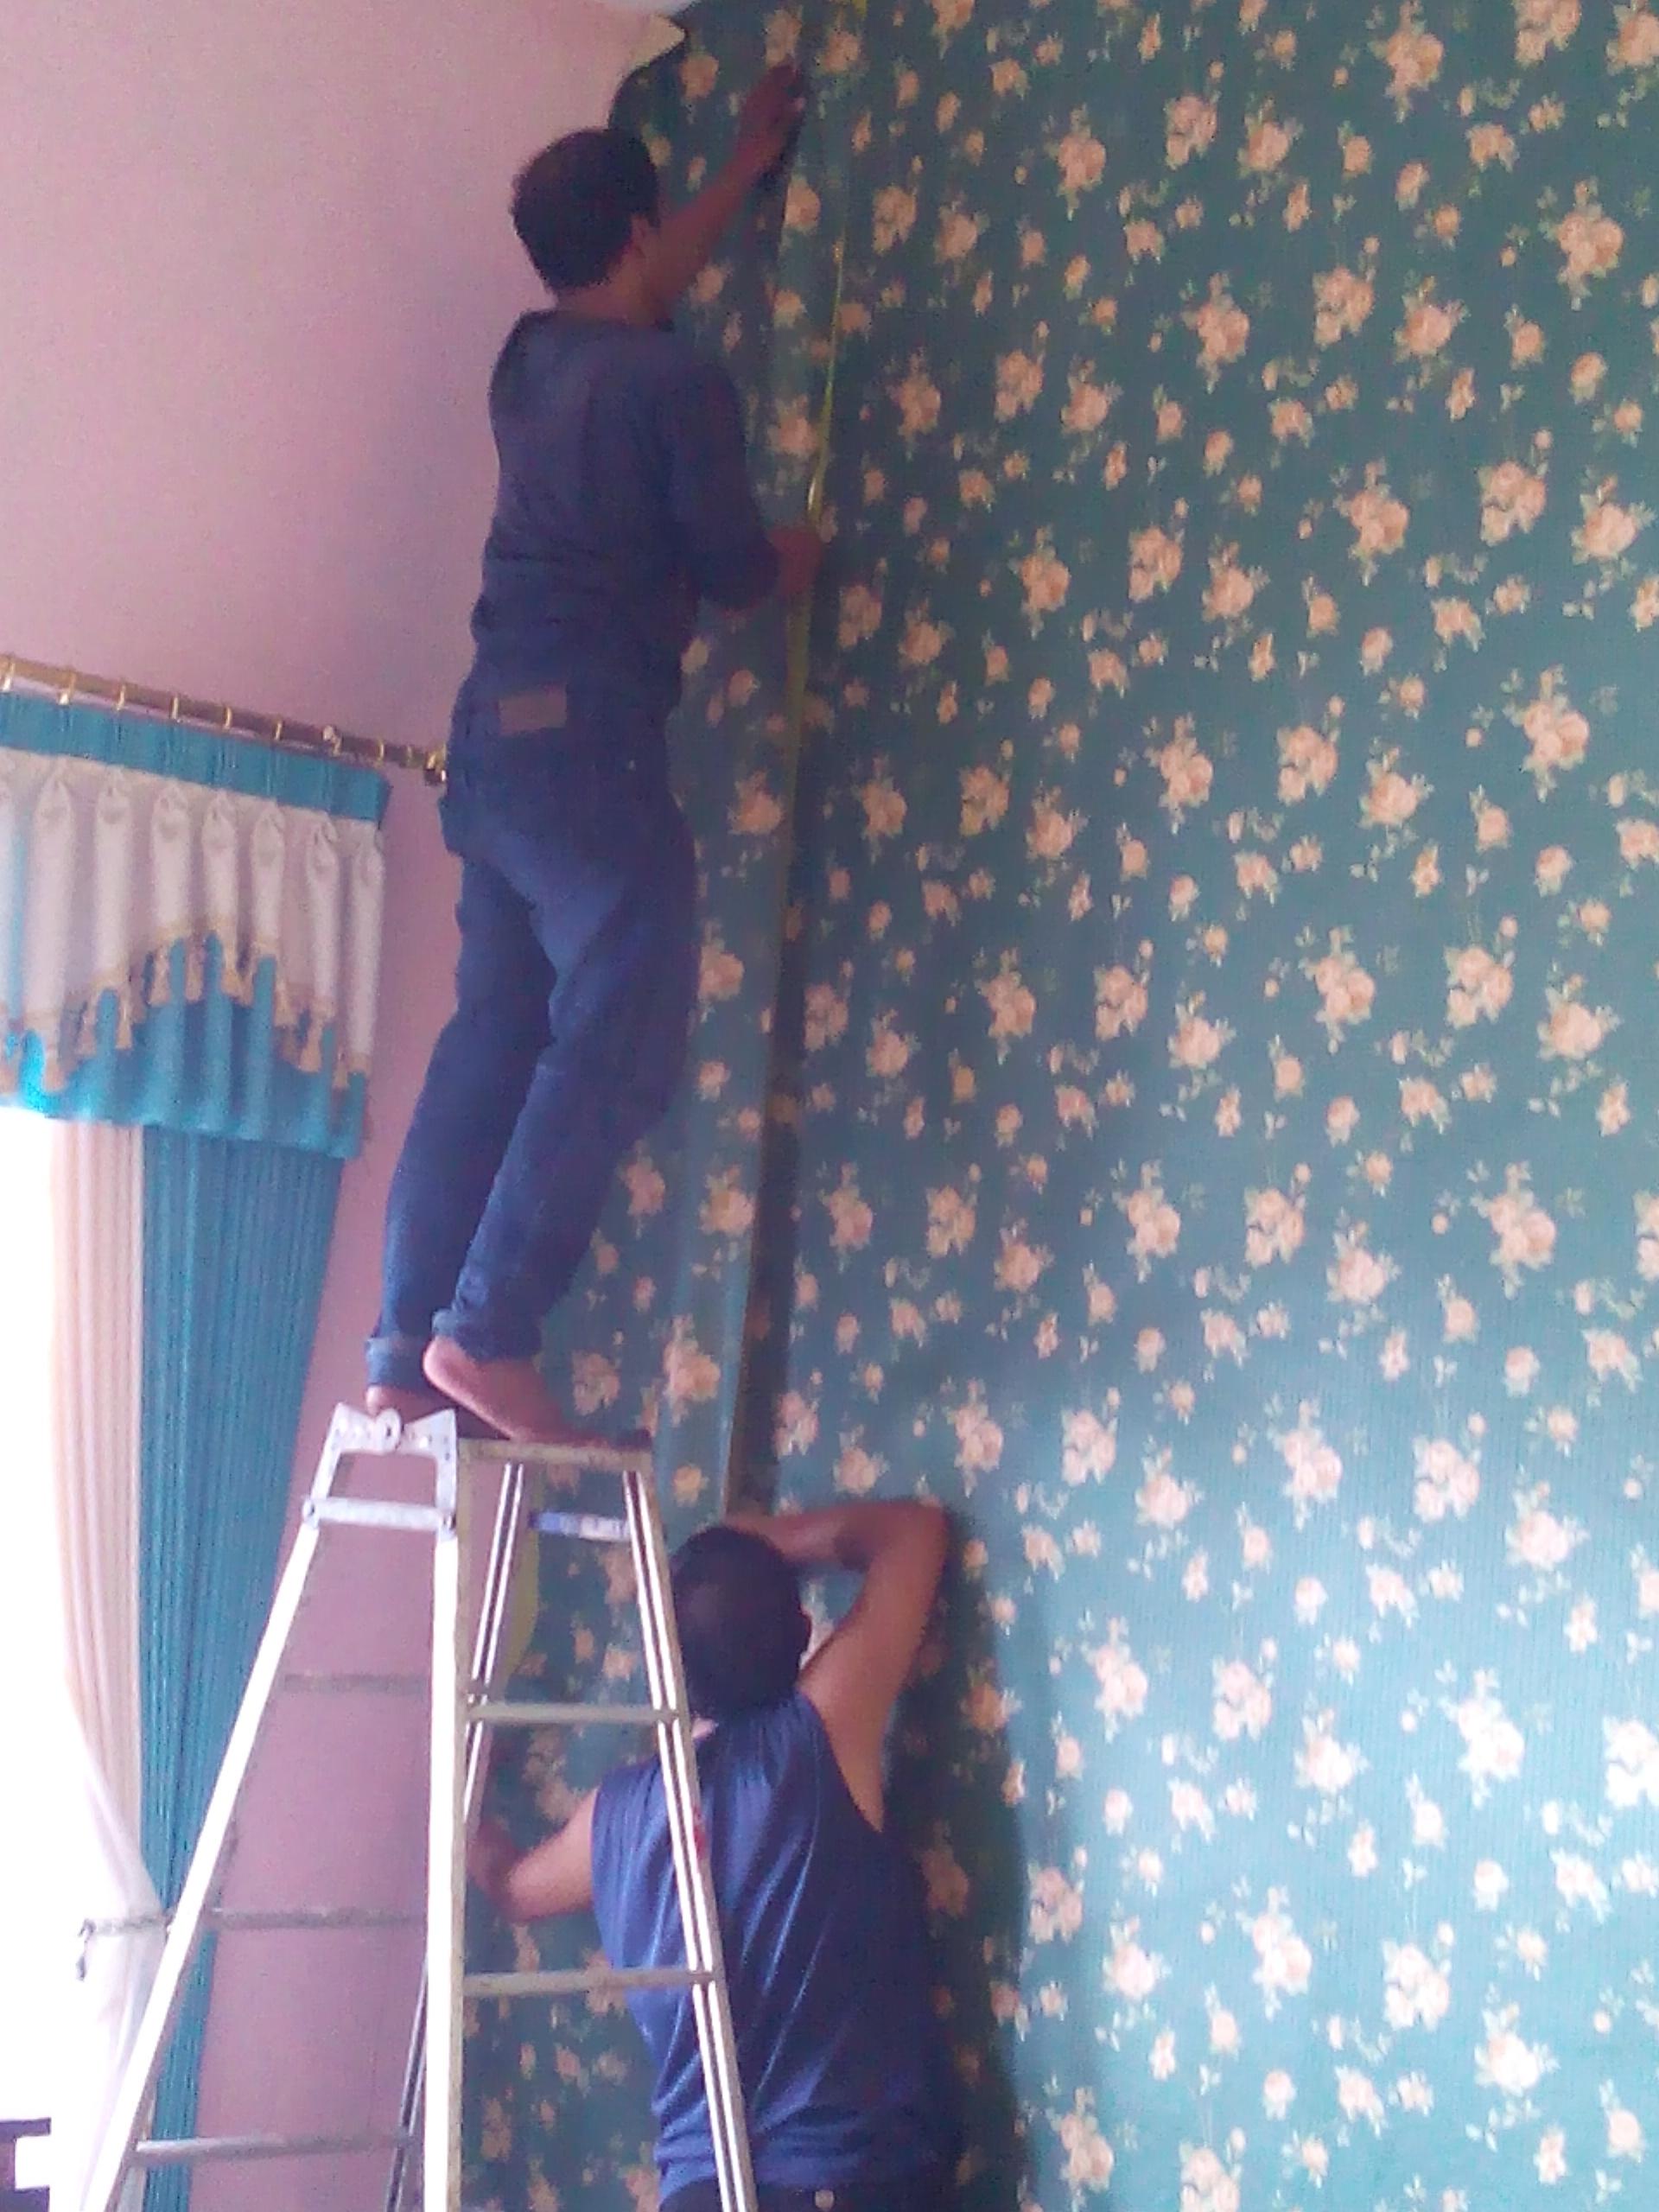 Hargawallpaperdindingmalang wallpaper dinding malang - Cara pasang wallpaper ...